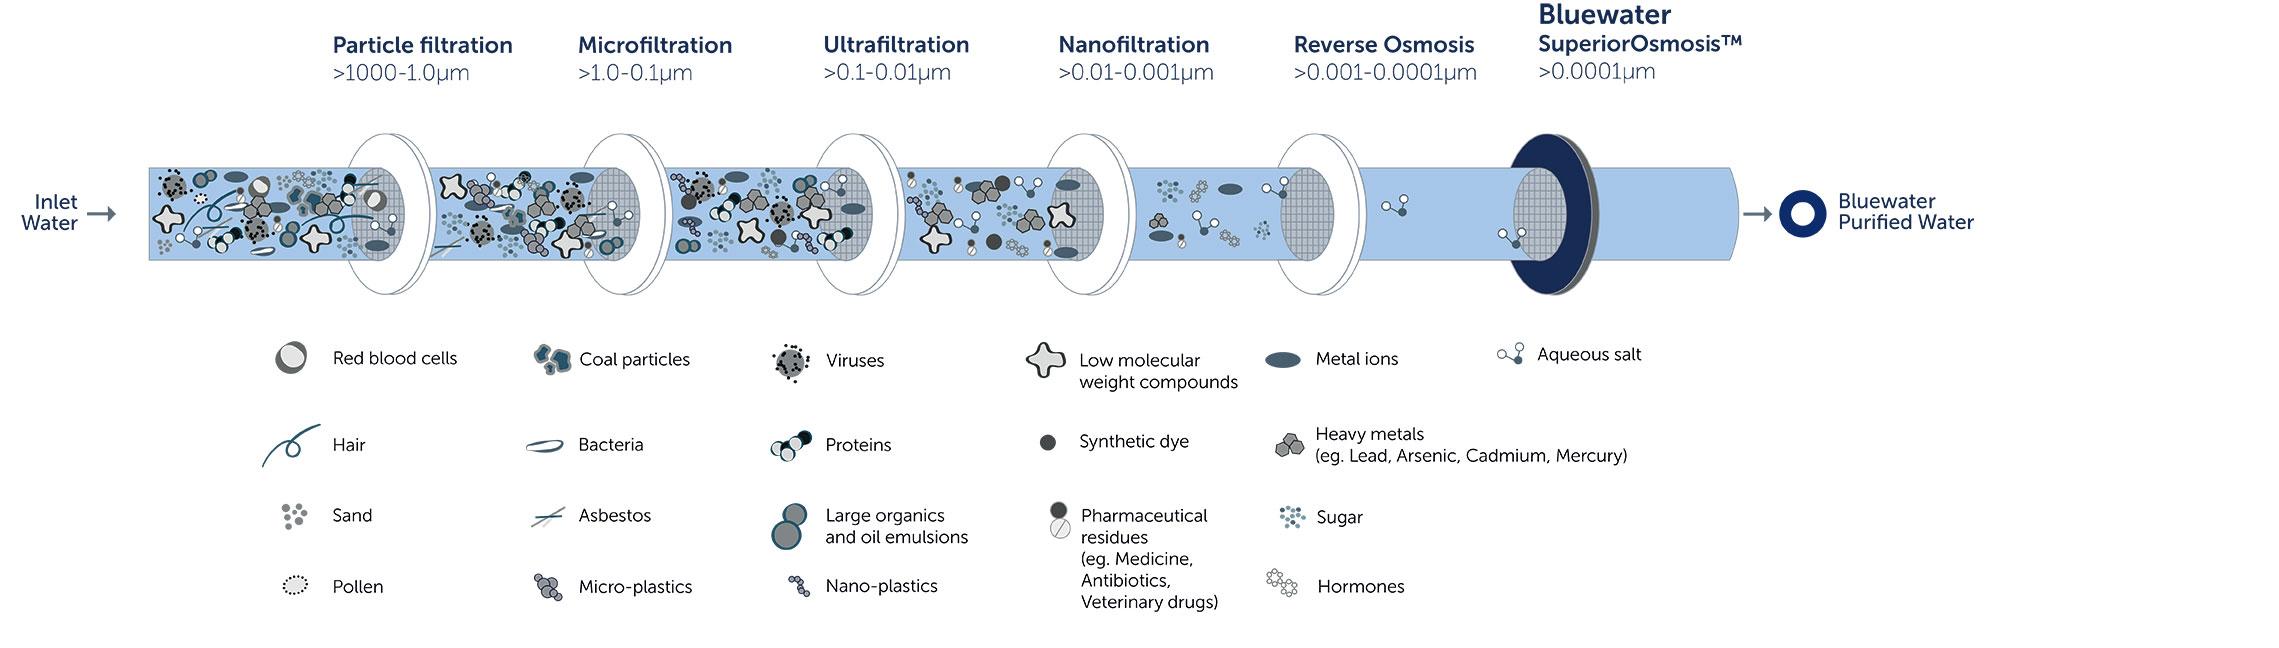 BluewaterSuperiorOsmosis™ purification technology